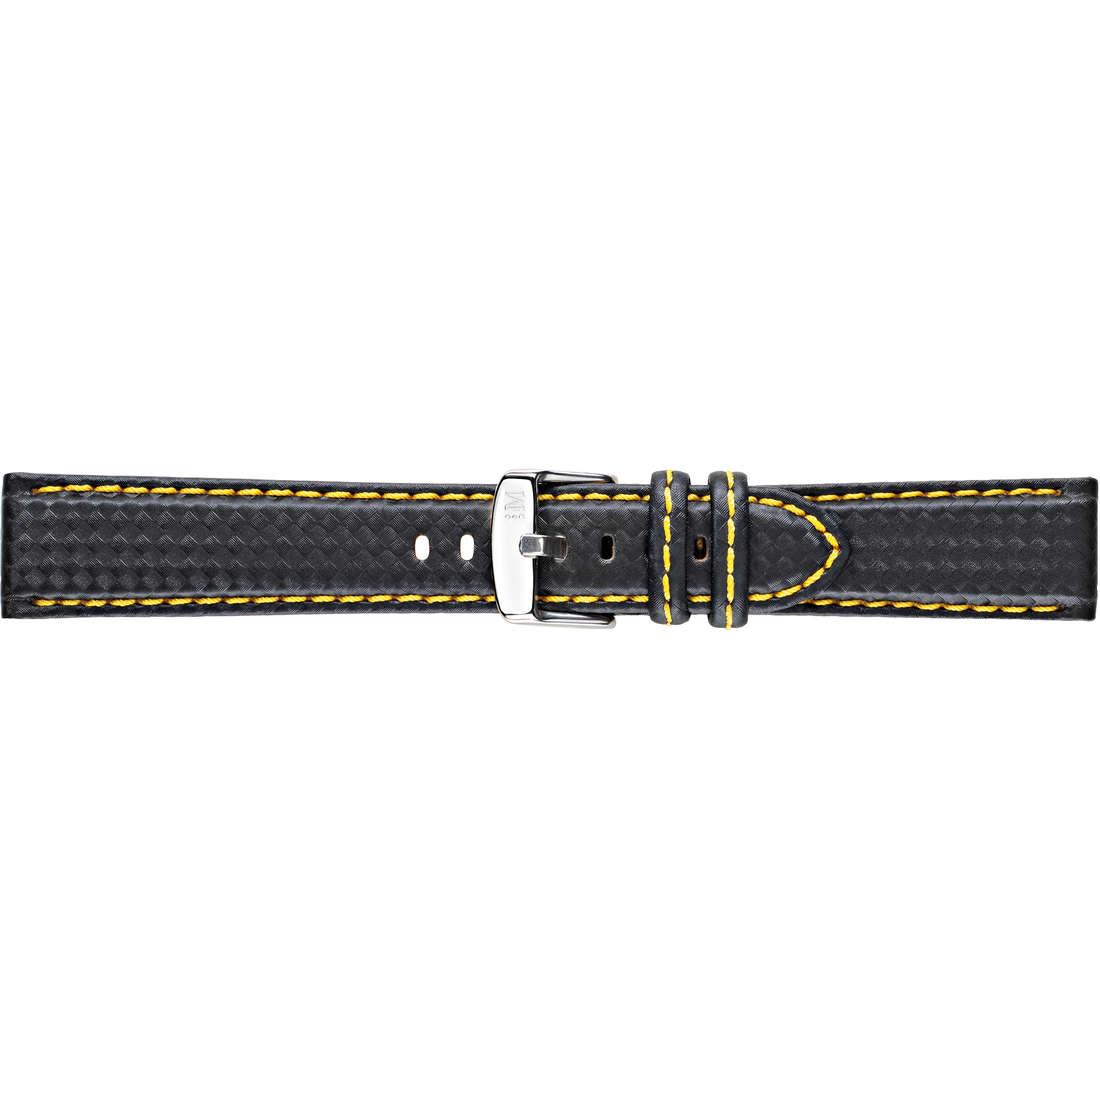 montre bande de montres homme Morellato Linea Sport A01U3586977897CR22